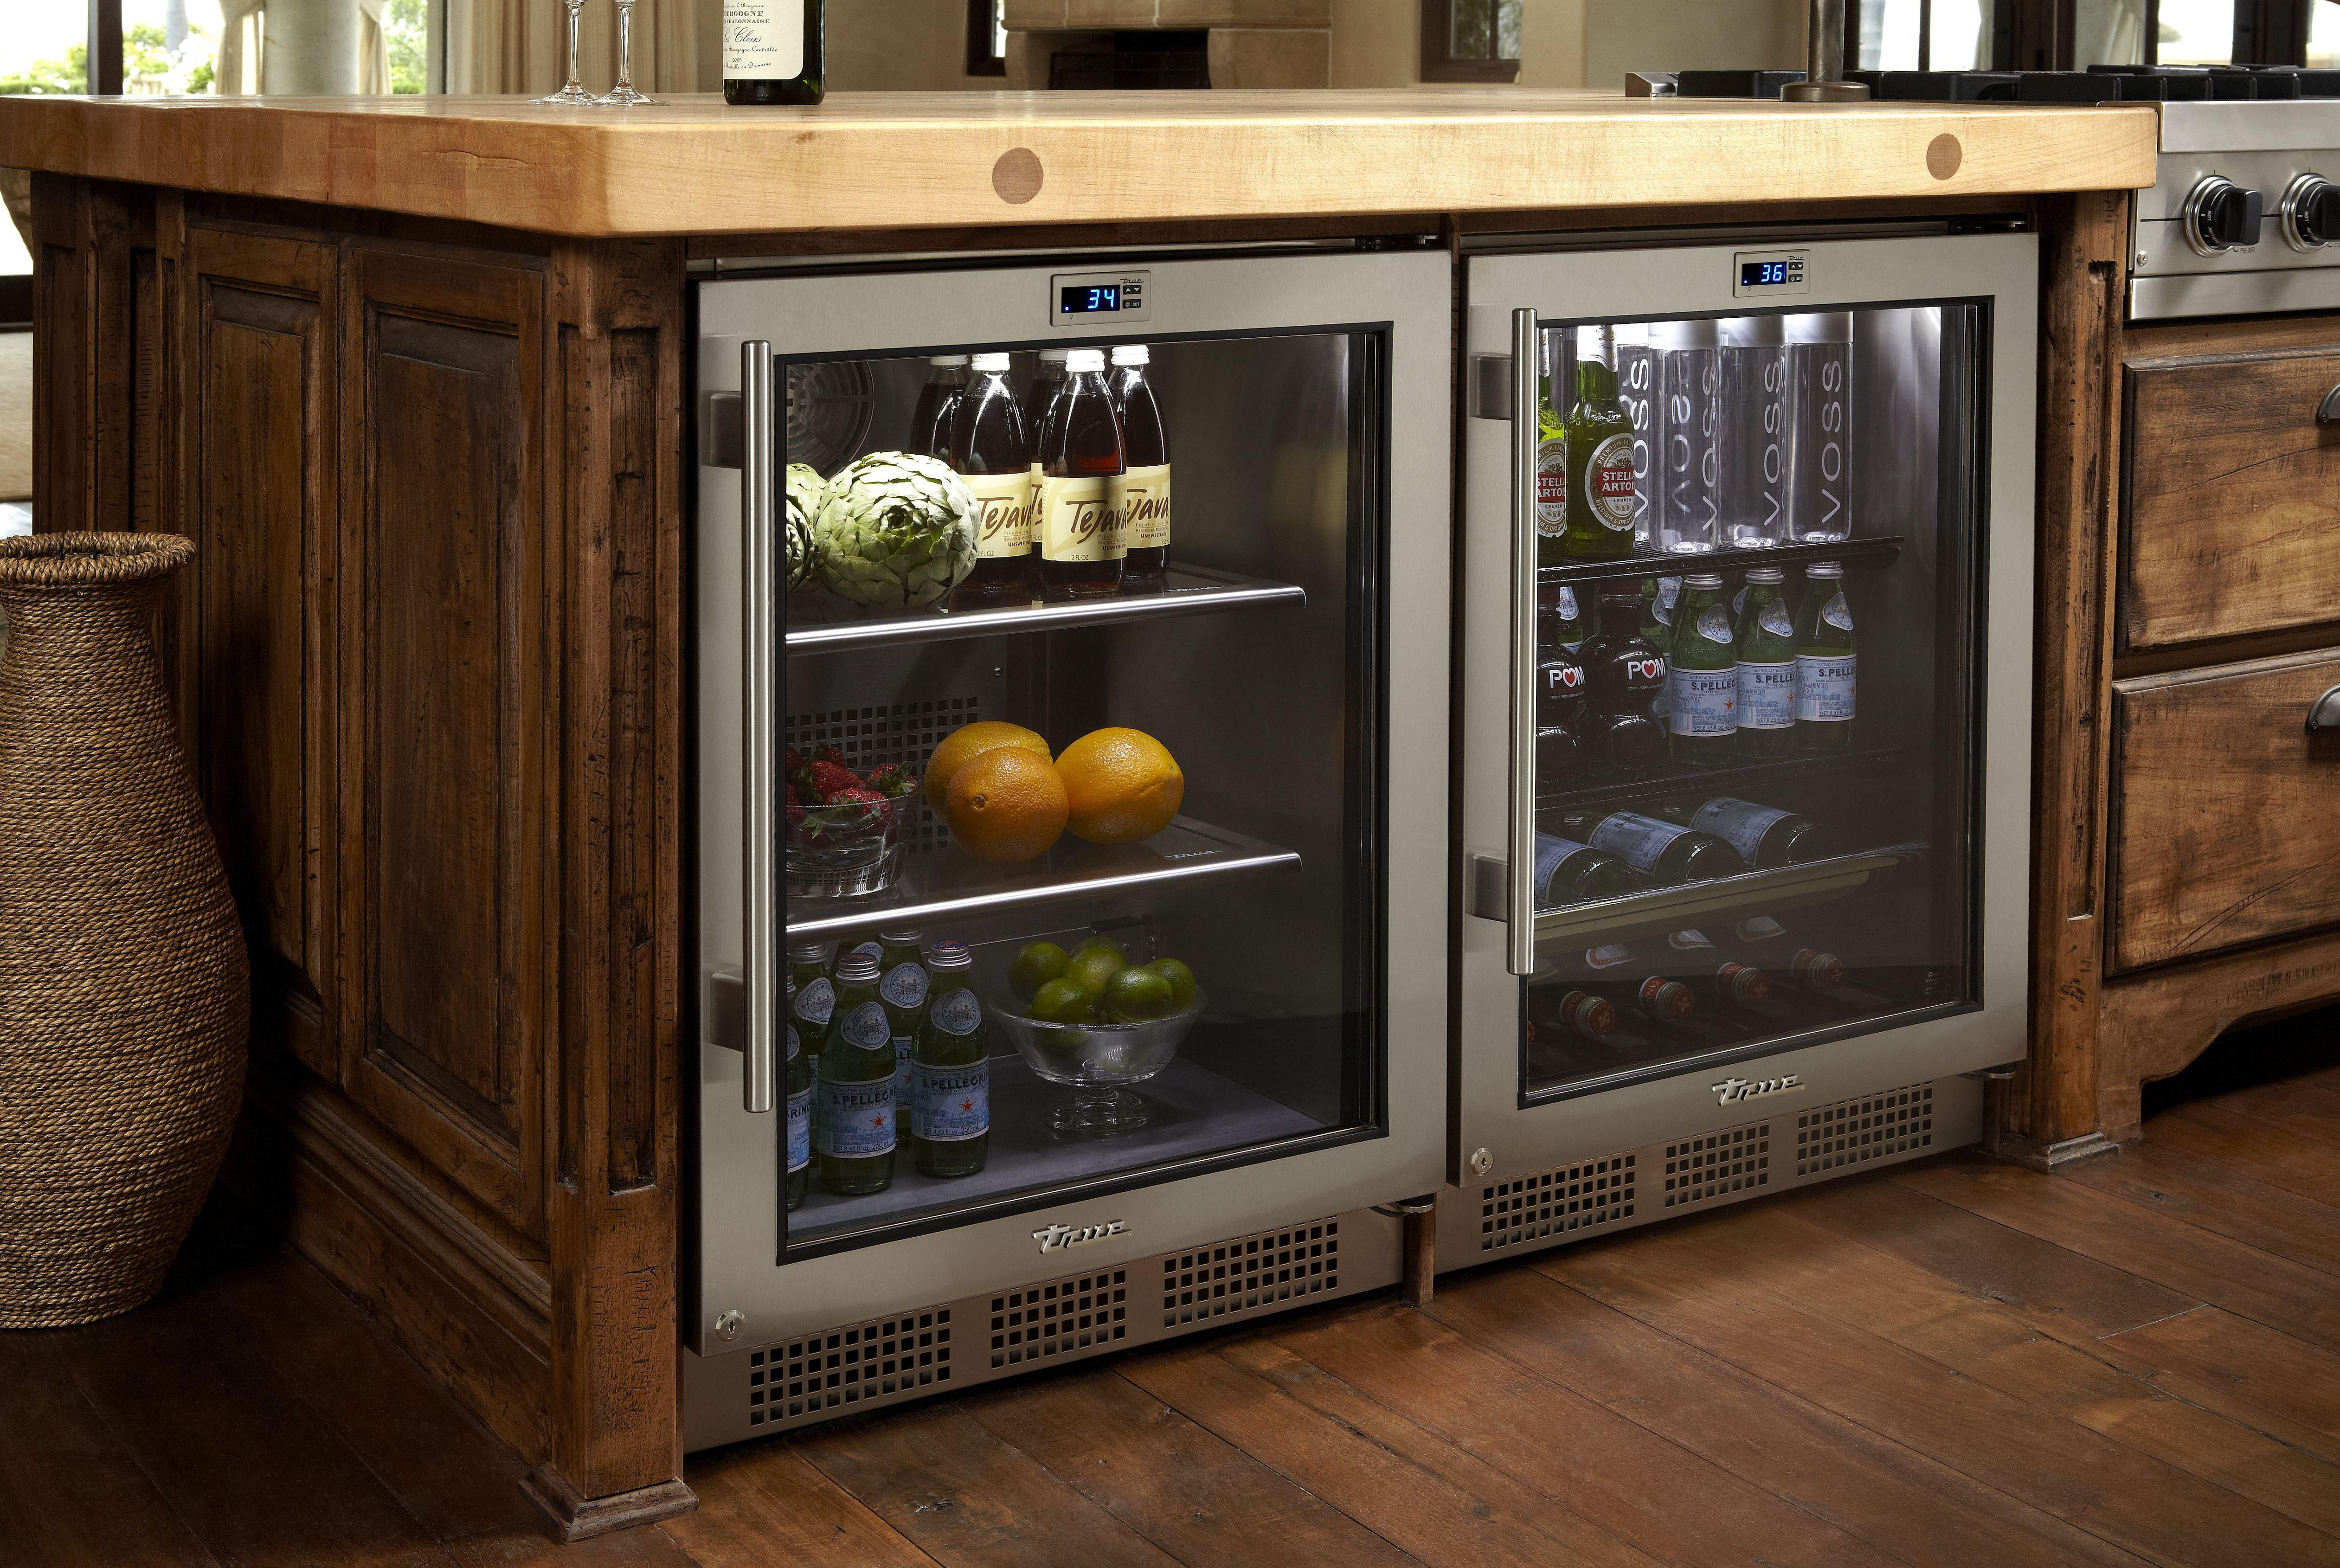 Undercounter Beverage Cooler Major Kitchen Appliances